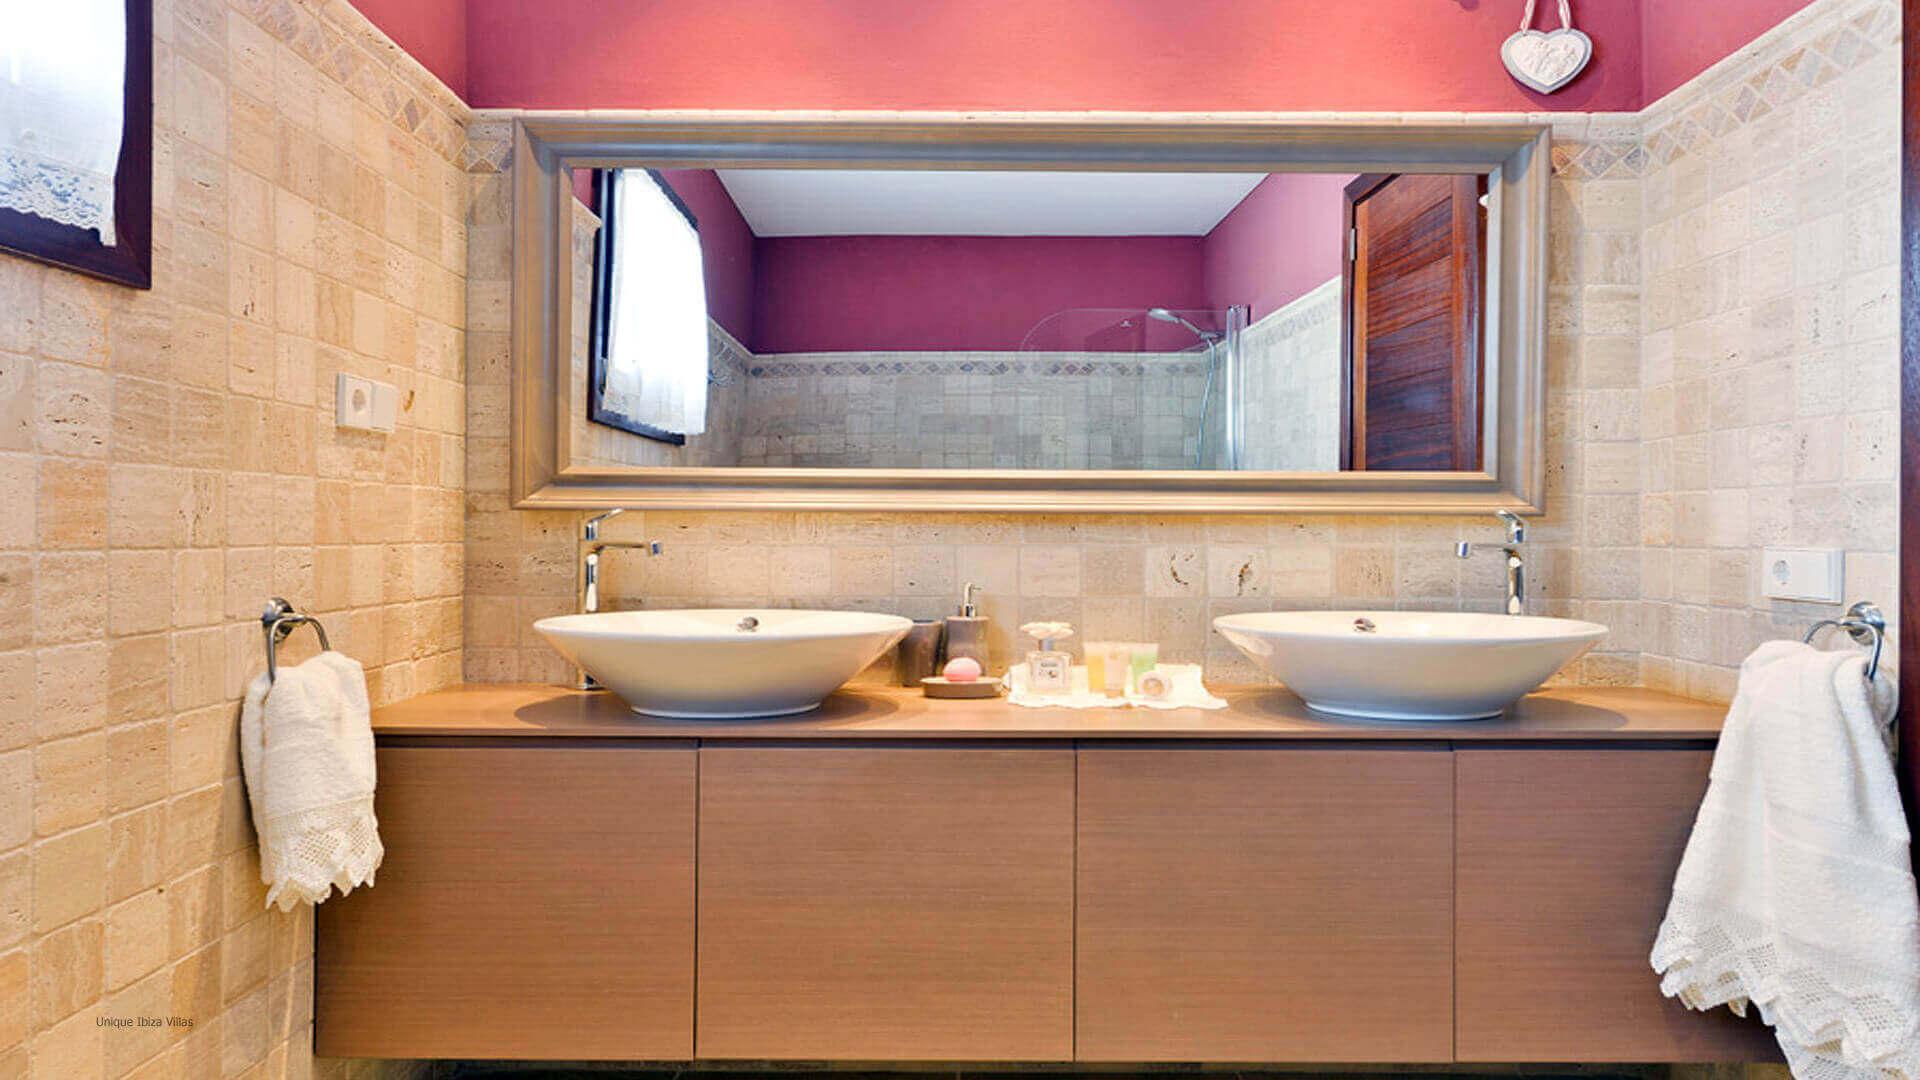 Raco De Sa Vinyeta Ibiza 43 Bathroom 2